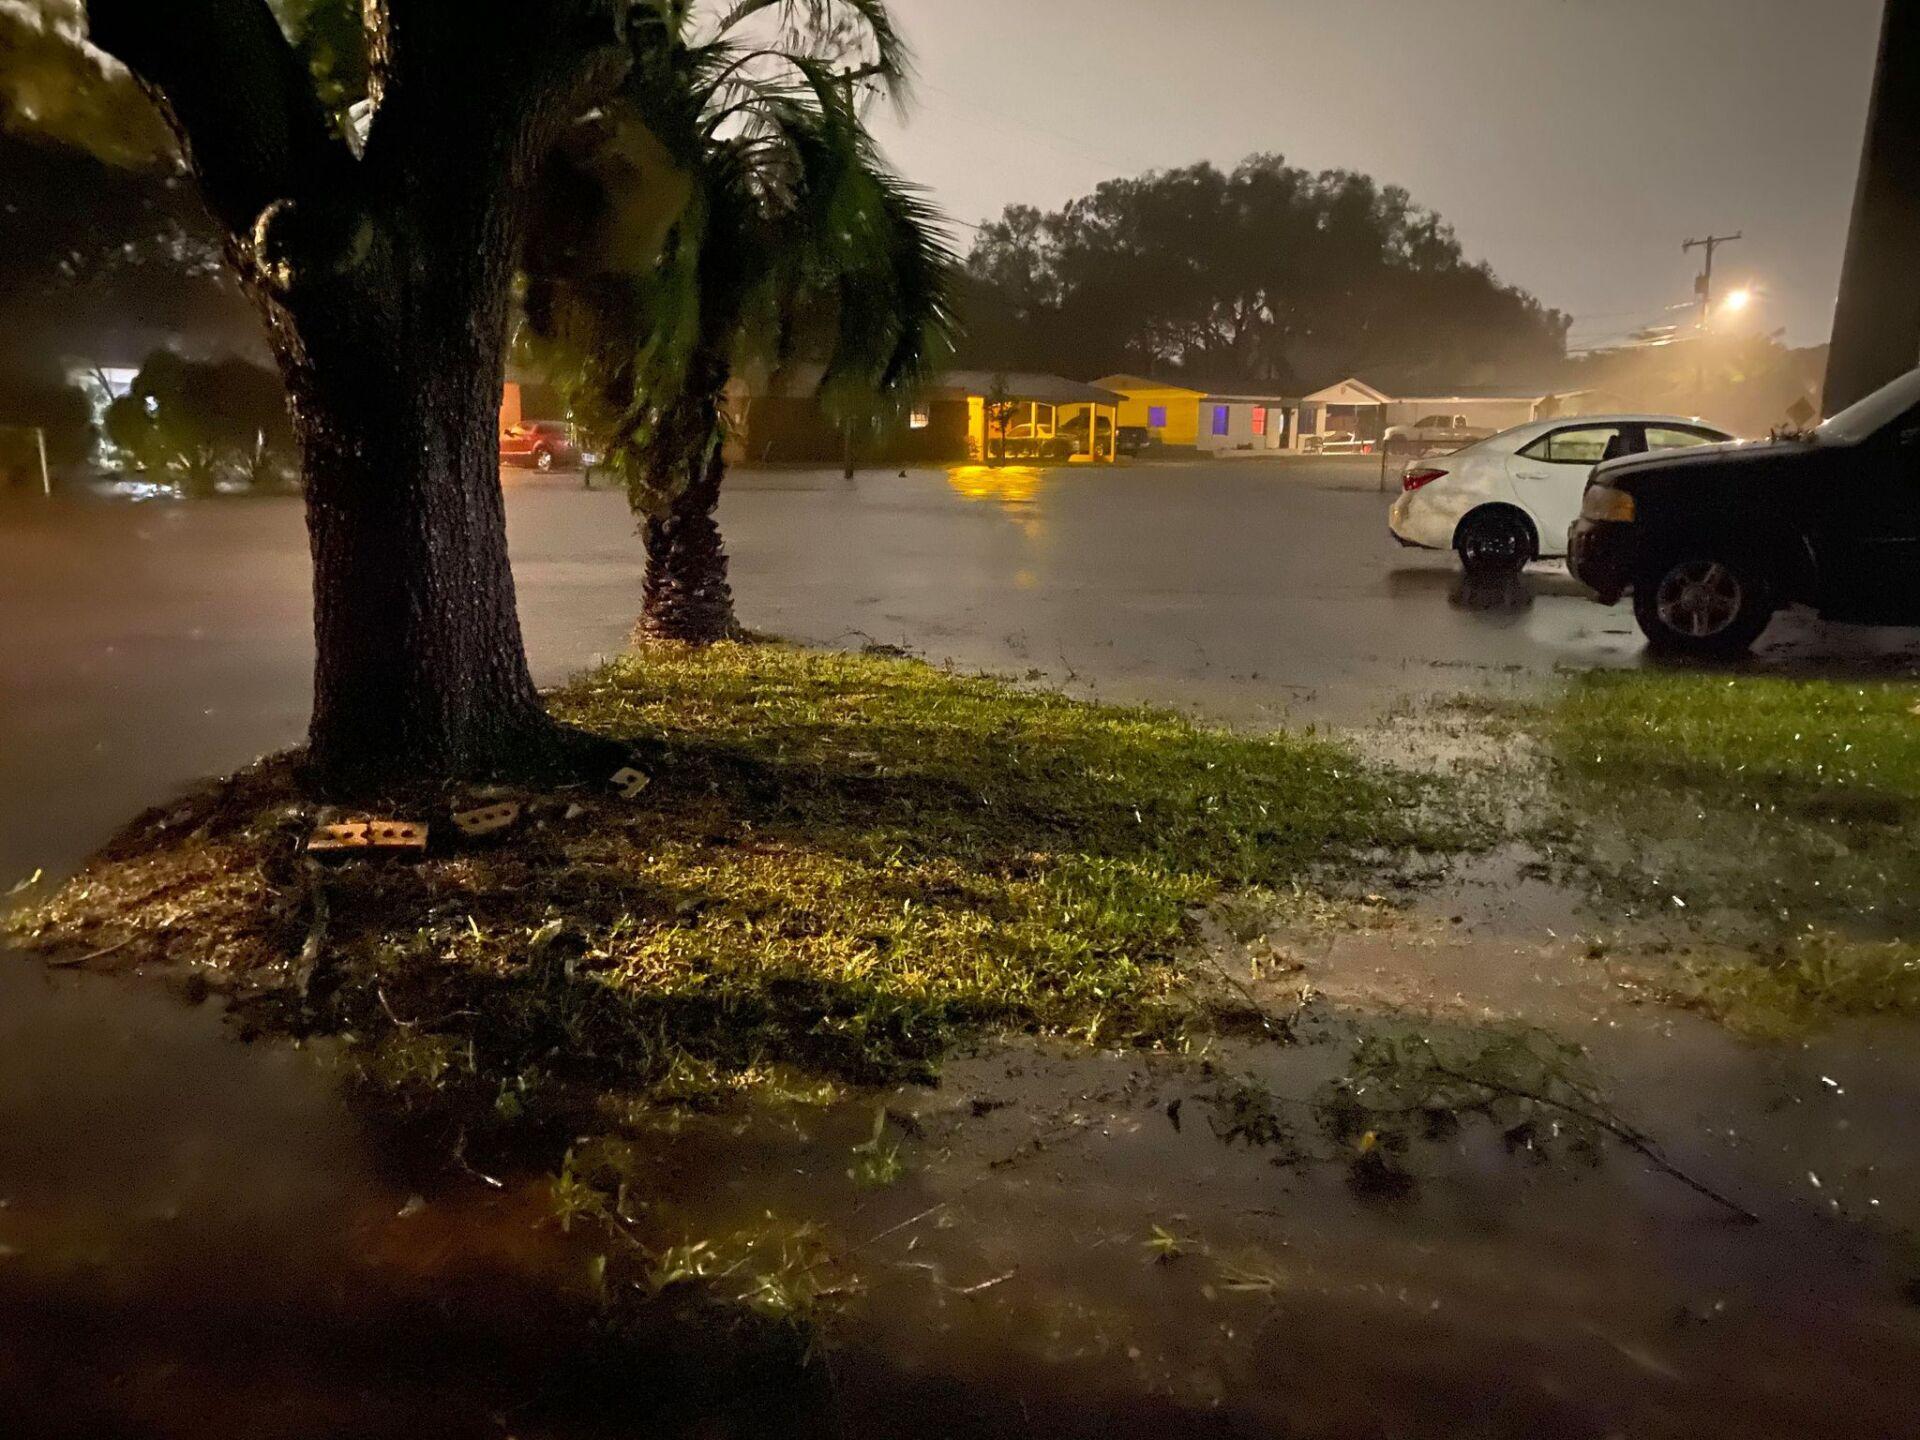 Oldsmar_Mobbly Bayou Flooding_Holli Purcell 2.jpg